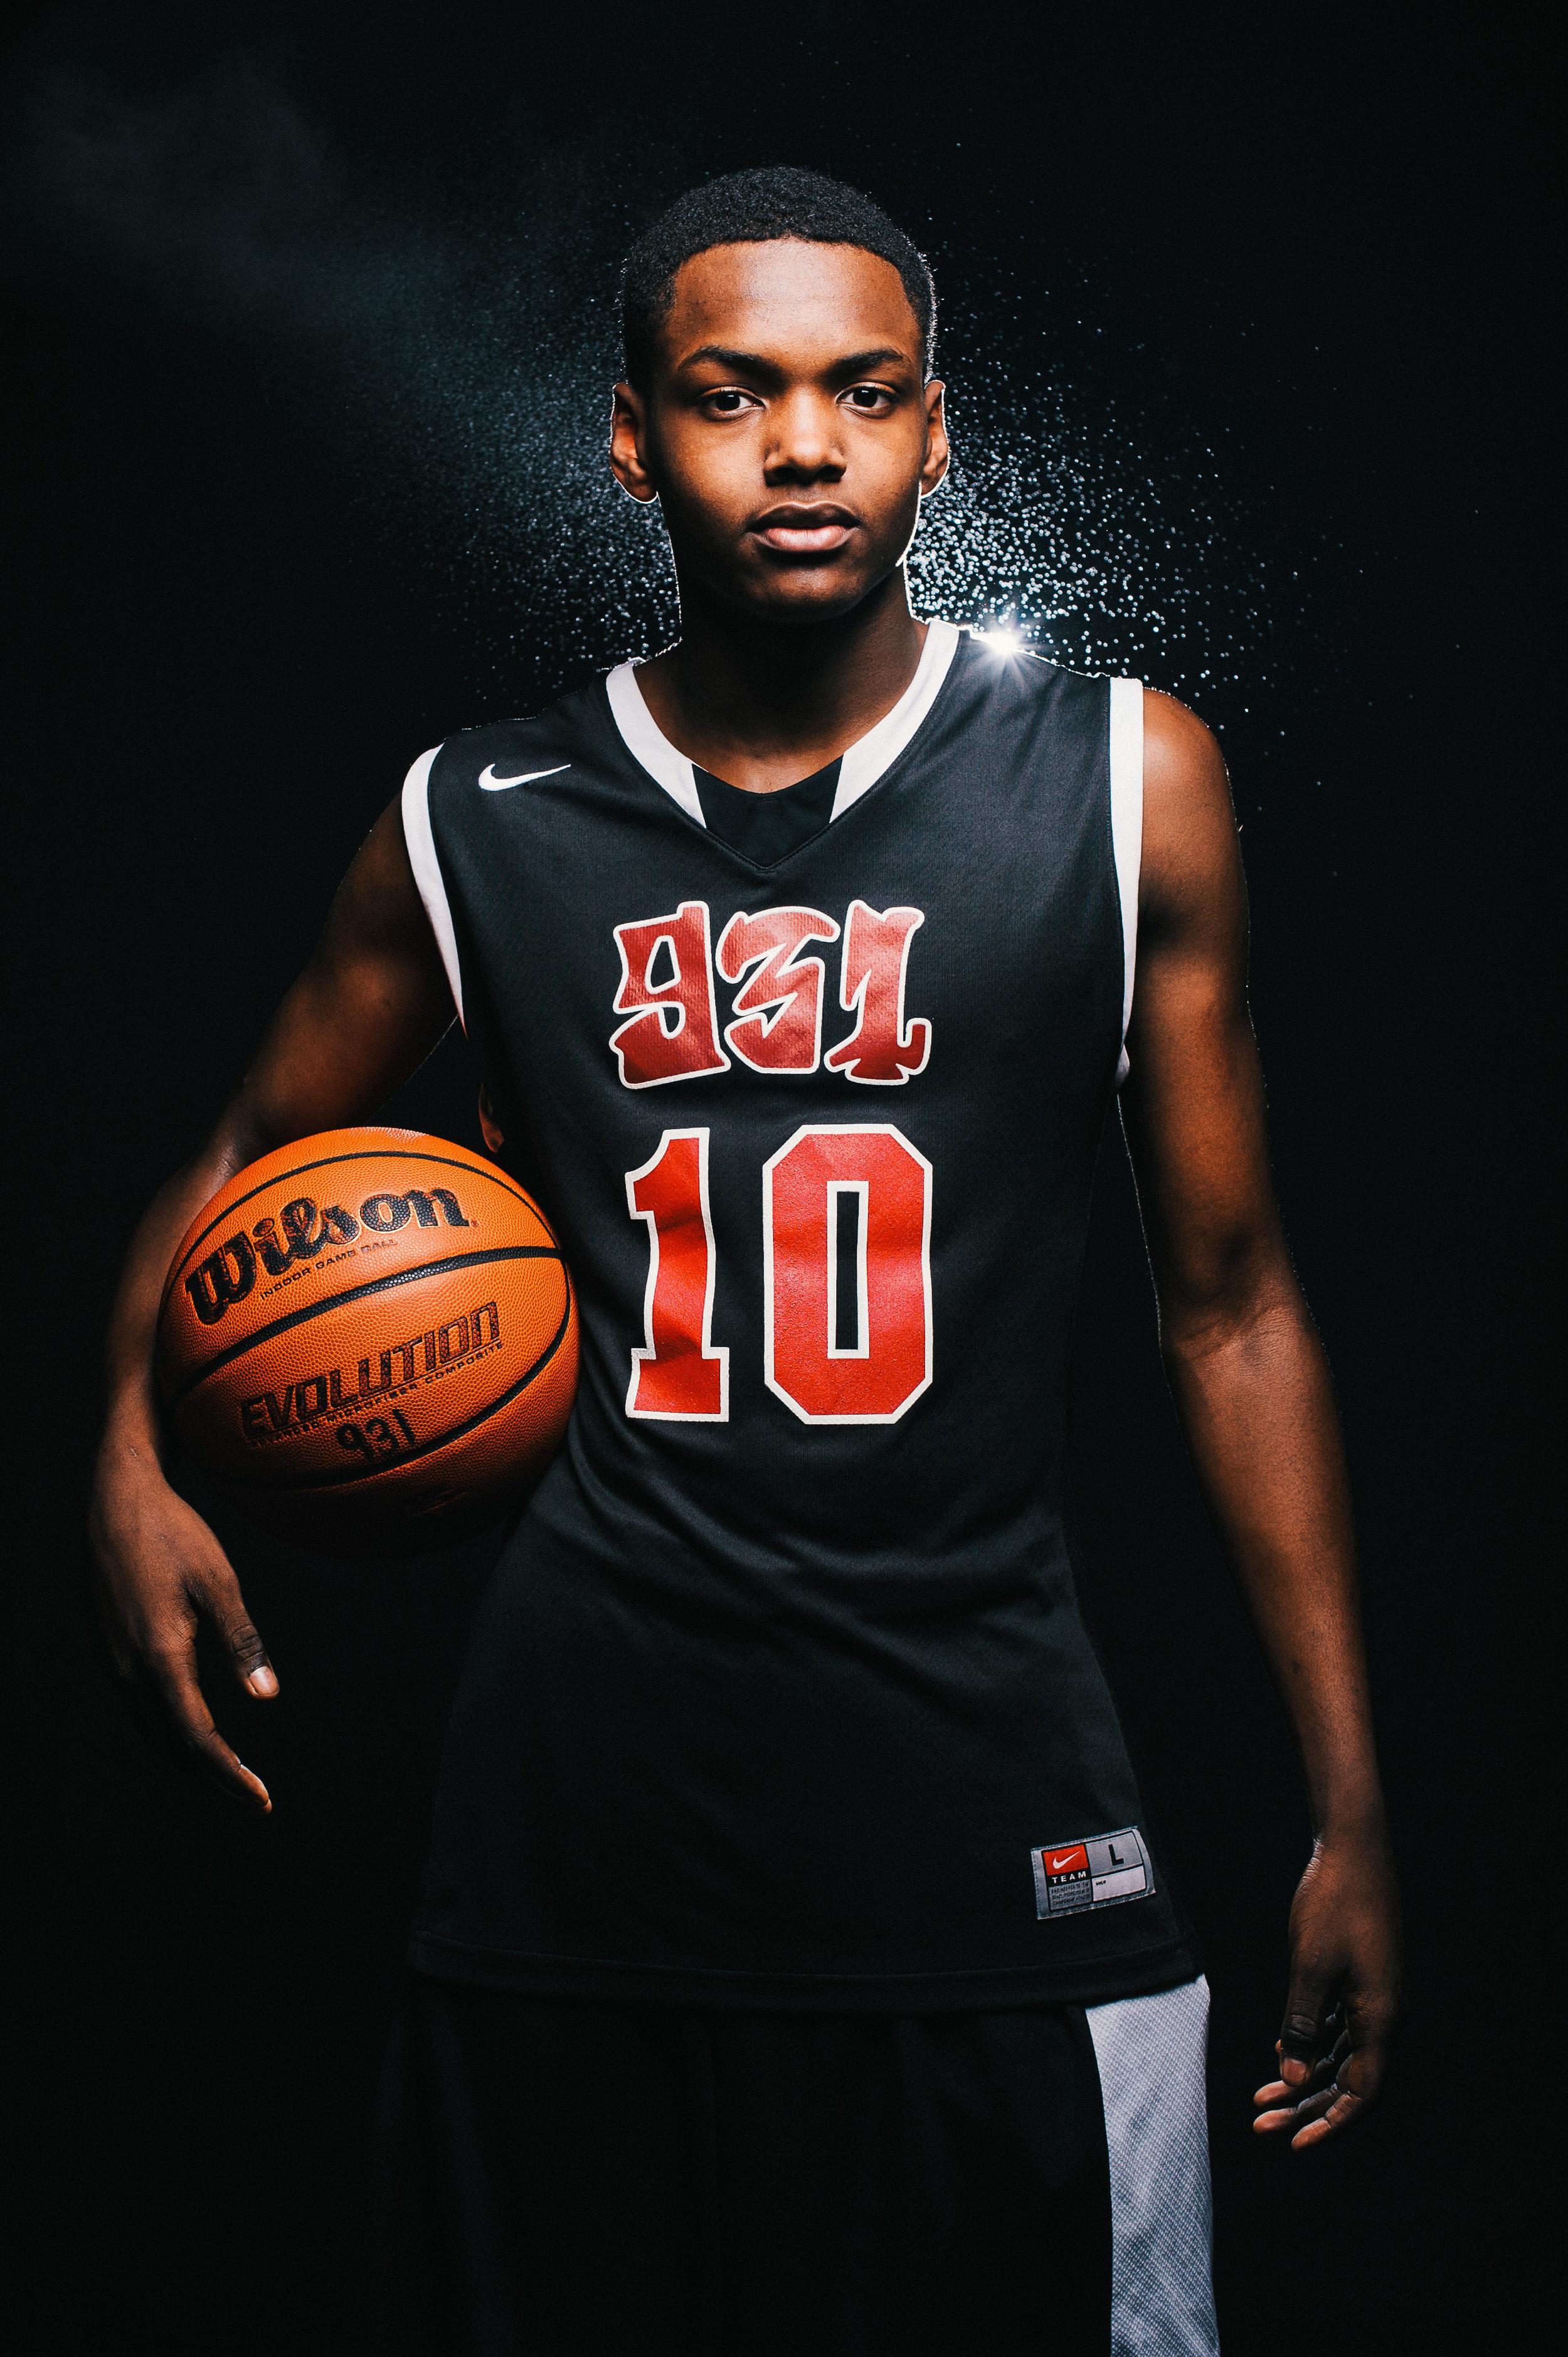 931-basketball-portraits-2014-205932.jpg